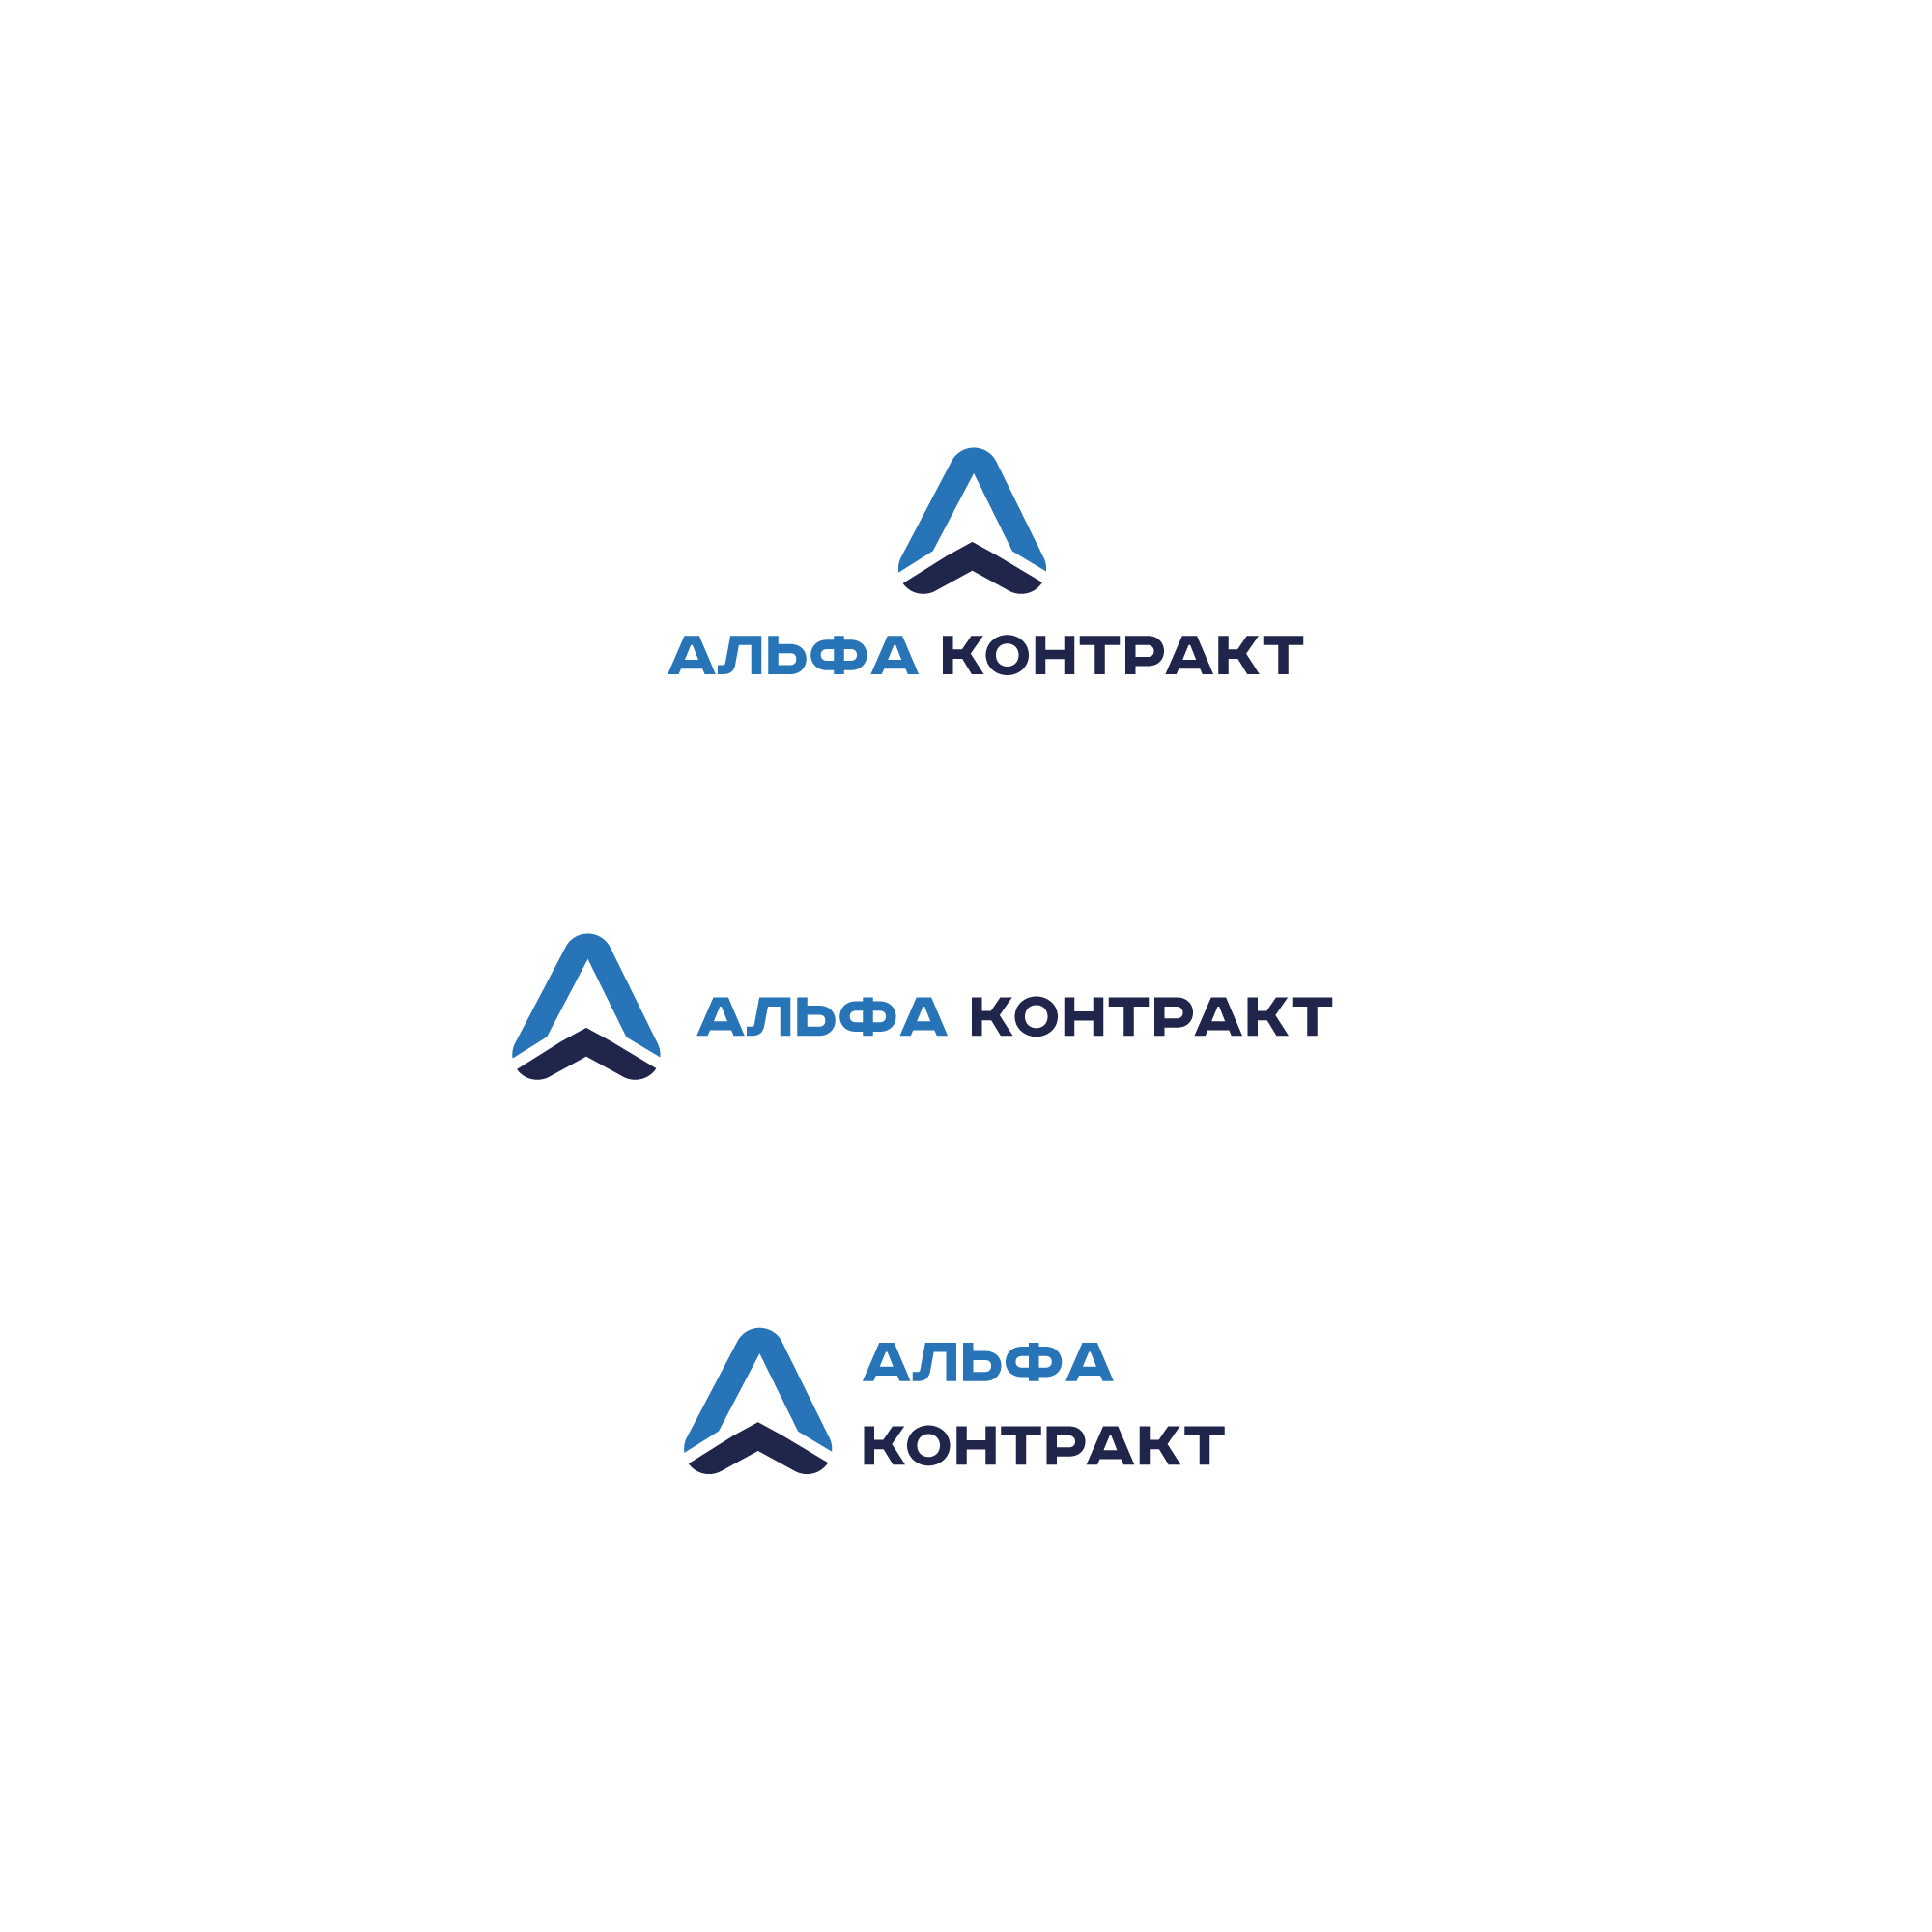 Дизайнер для разработки логотипа компании фото f_5775bfd1e98b15a8.jpg